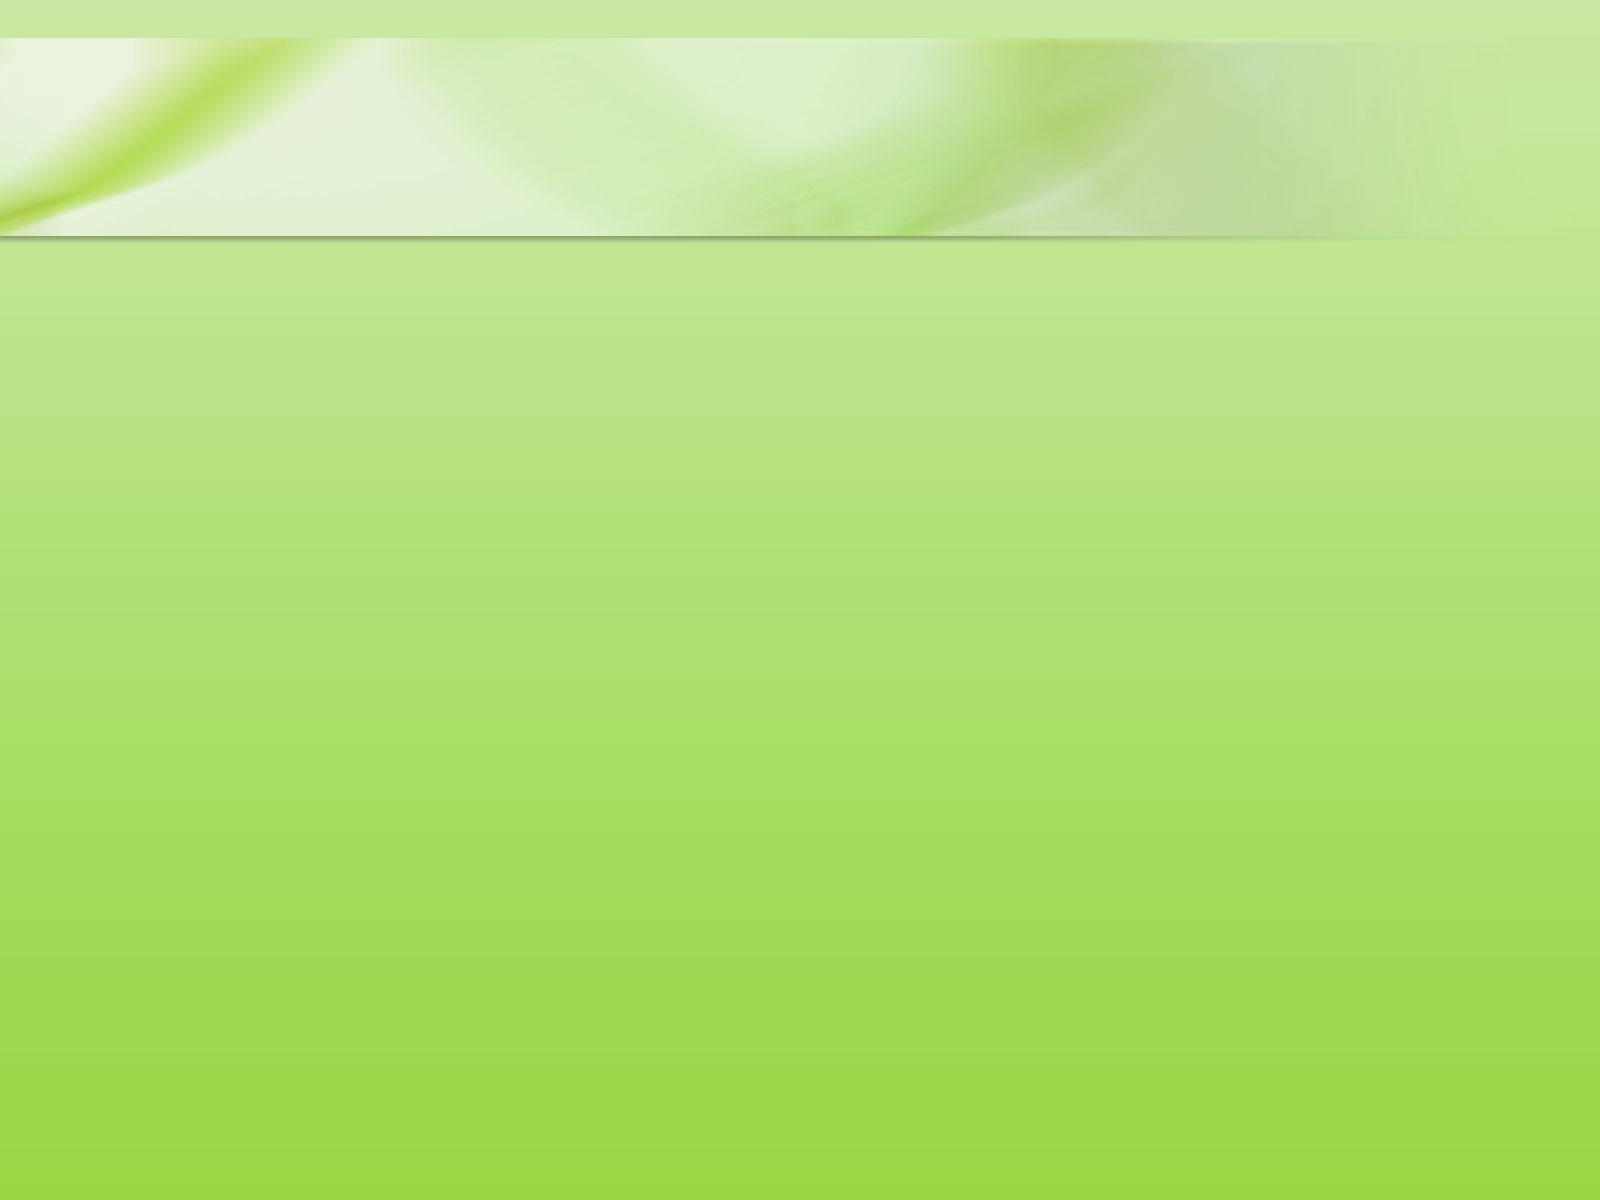 Green and White Wallpaper - WallpaperSafari